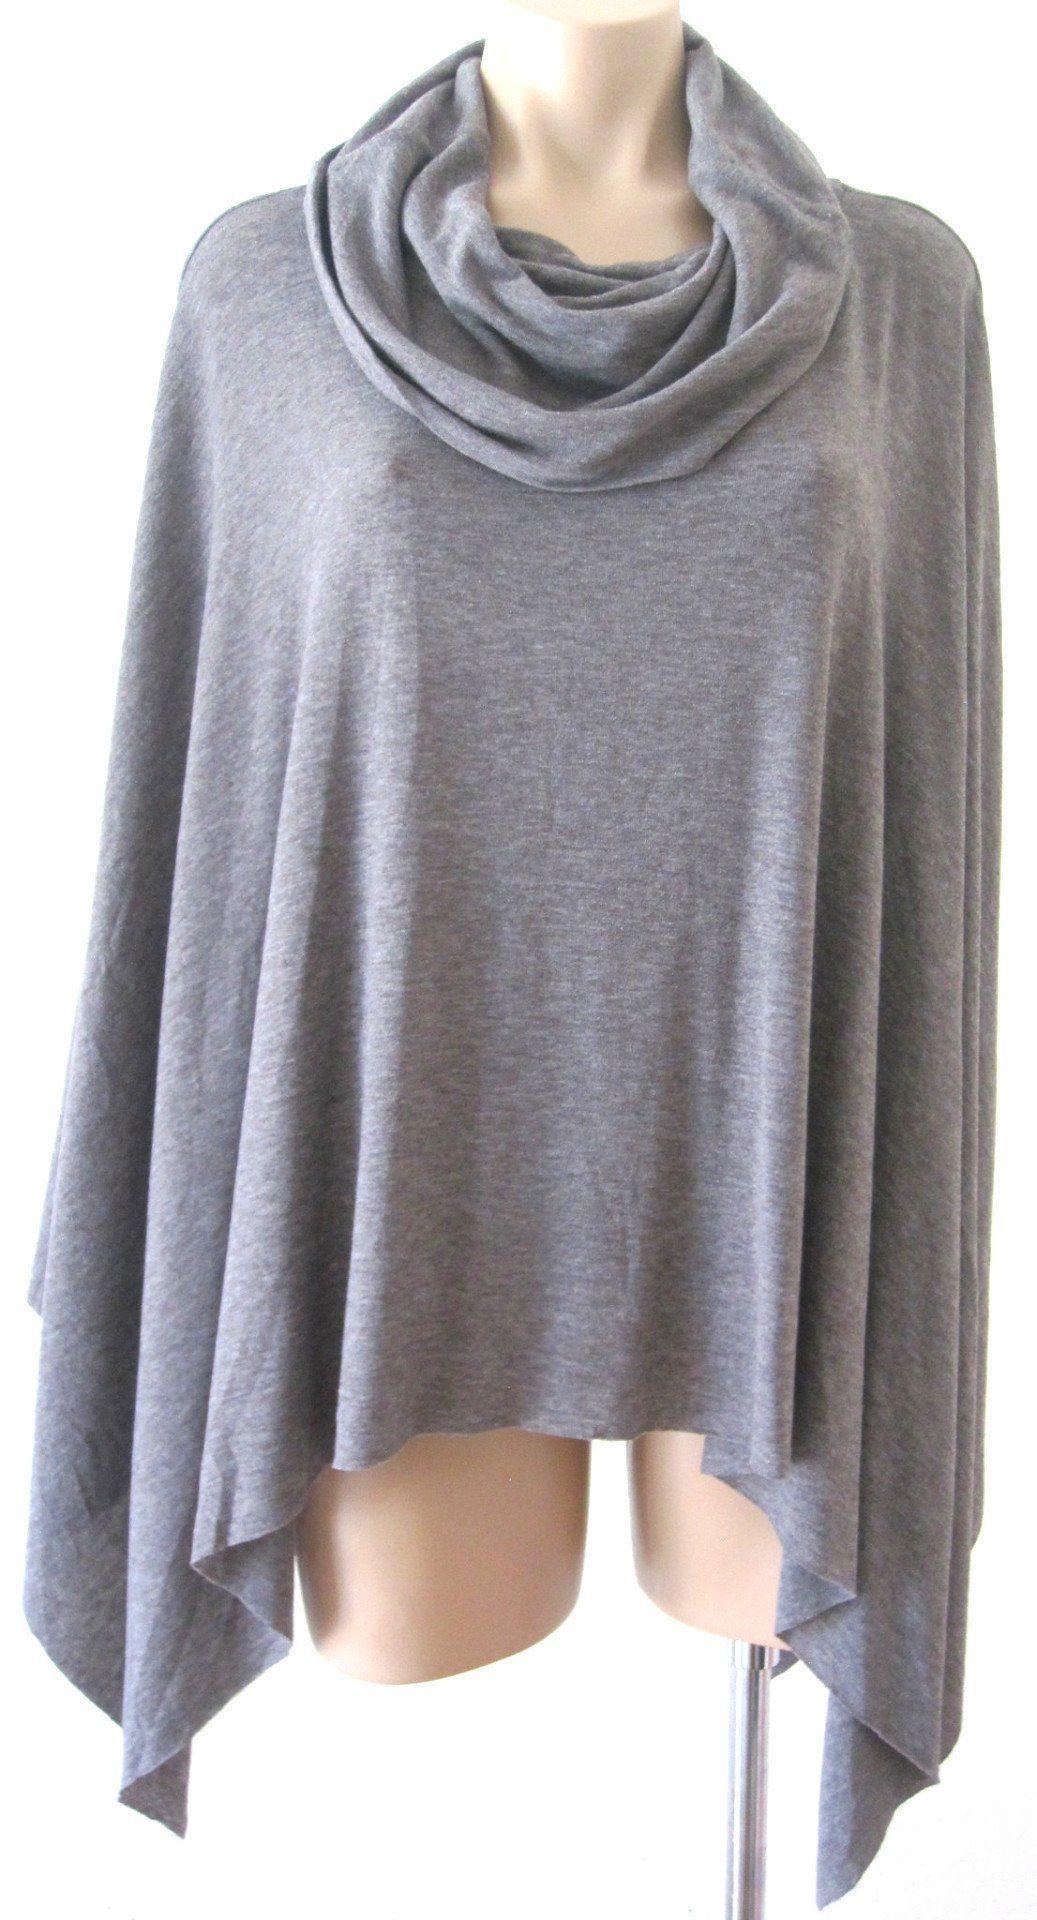 Ellie mei womenus grey multiwear maxi dress cape coverup khl